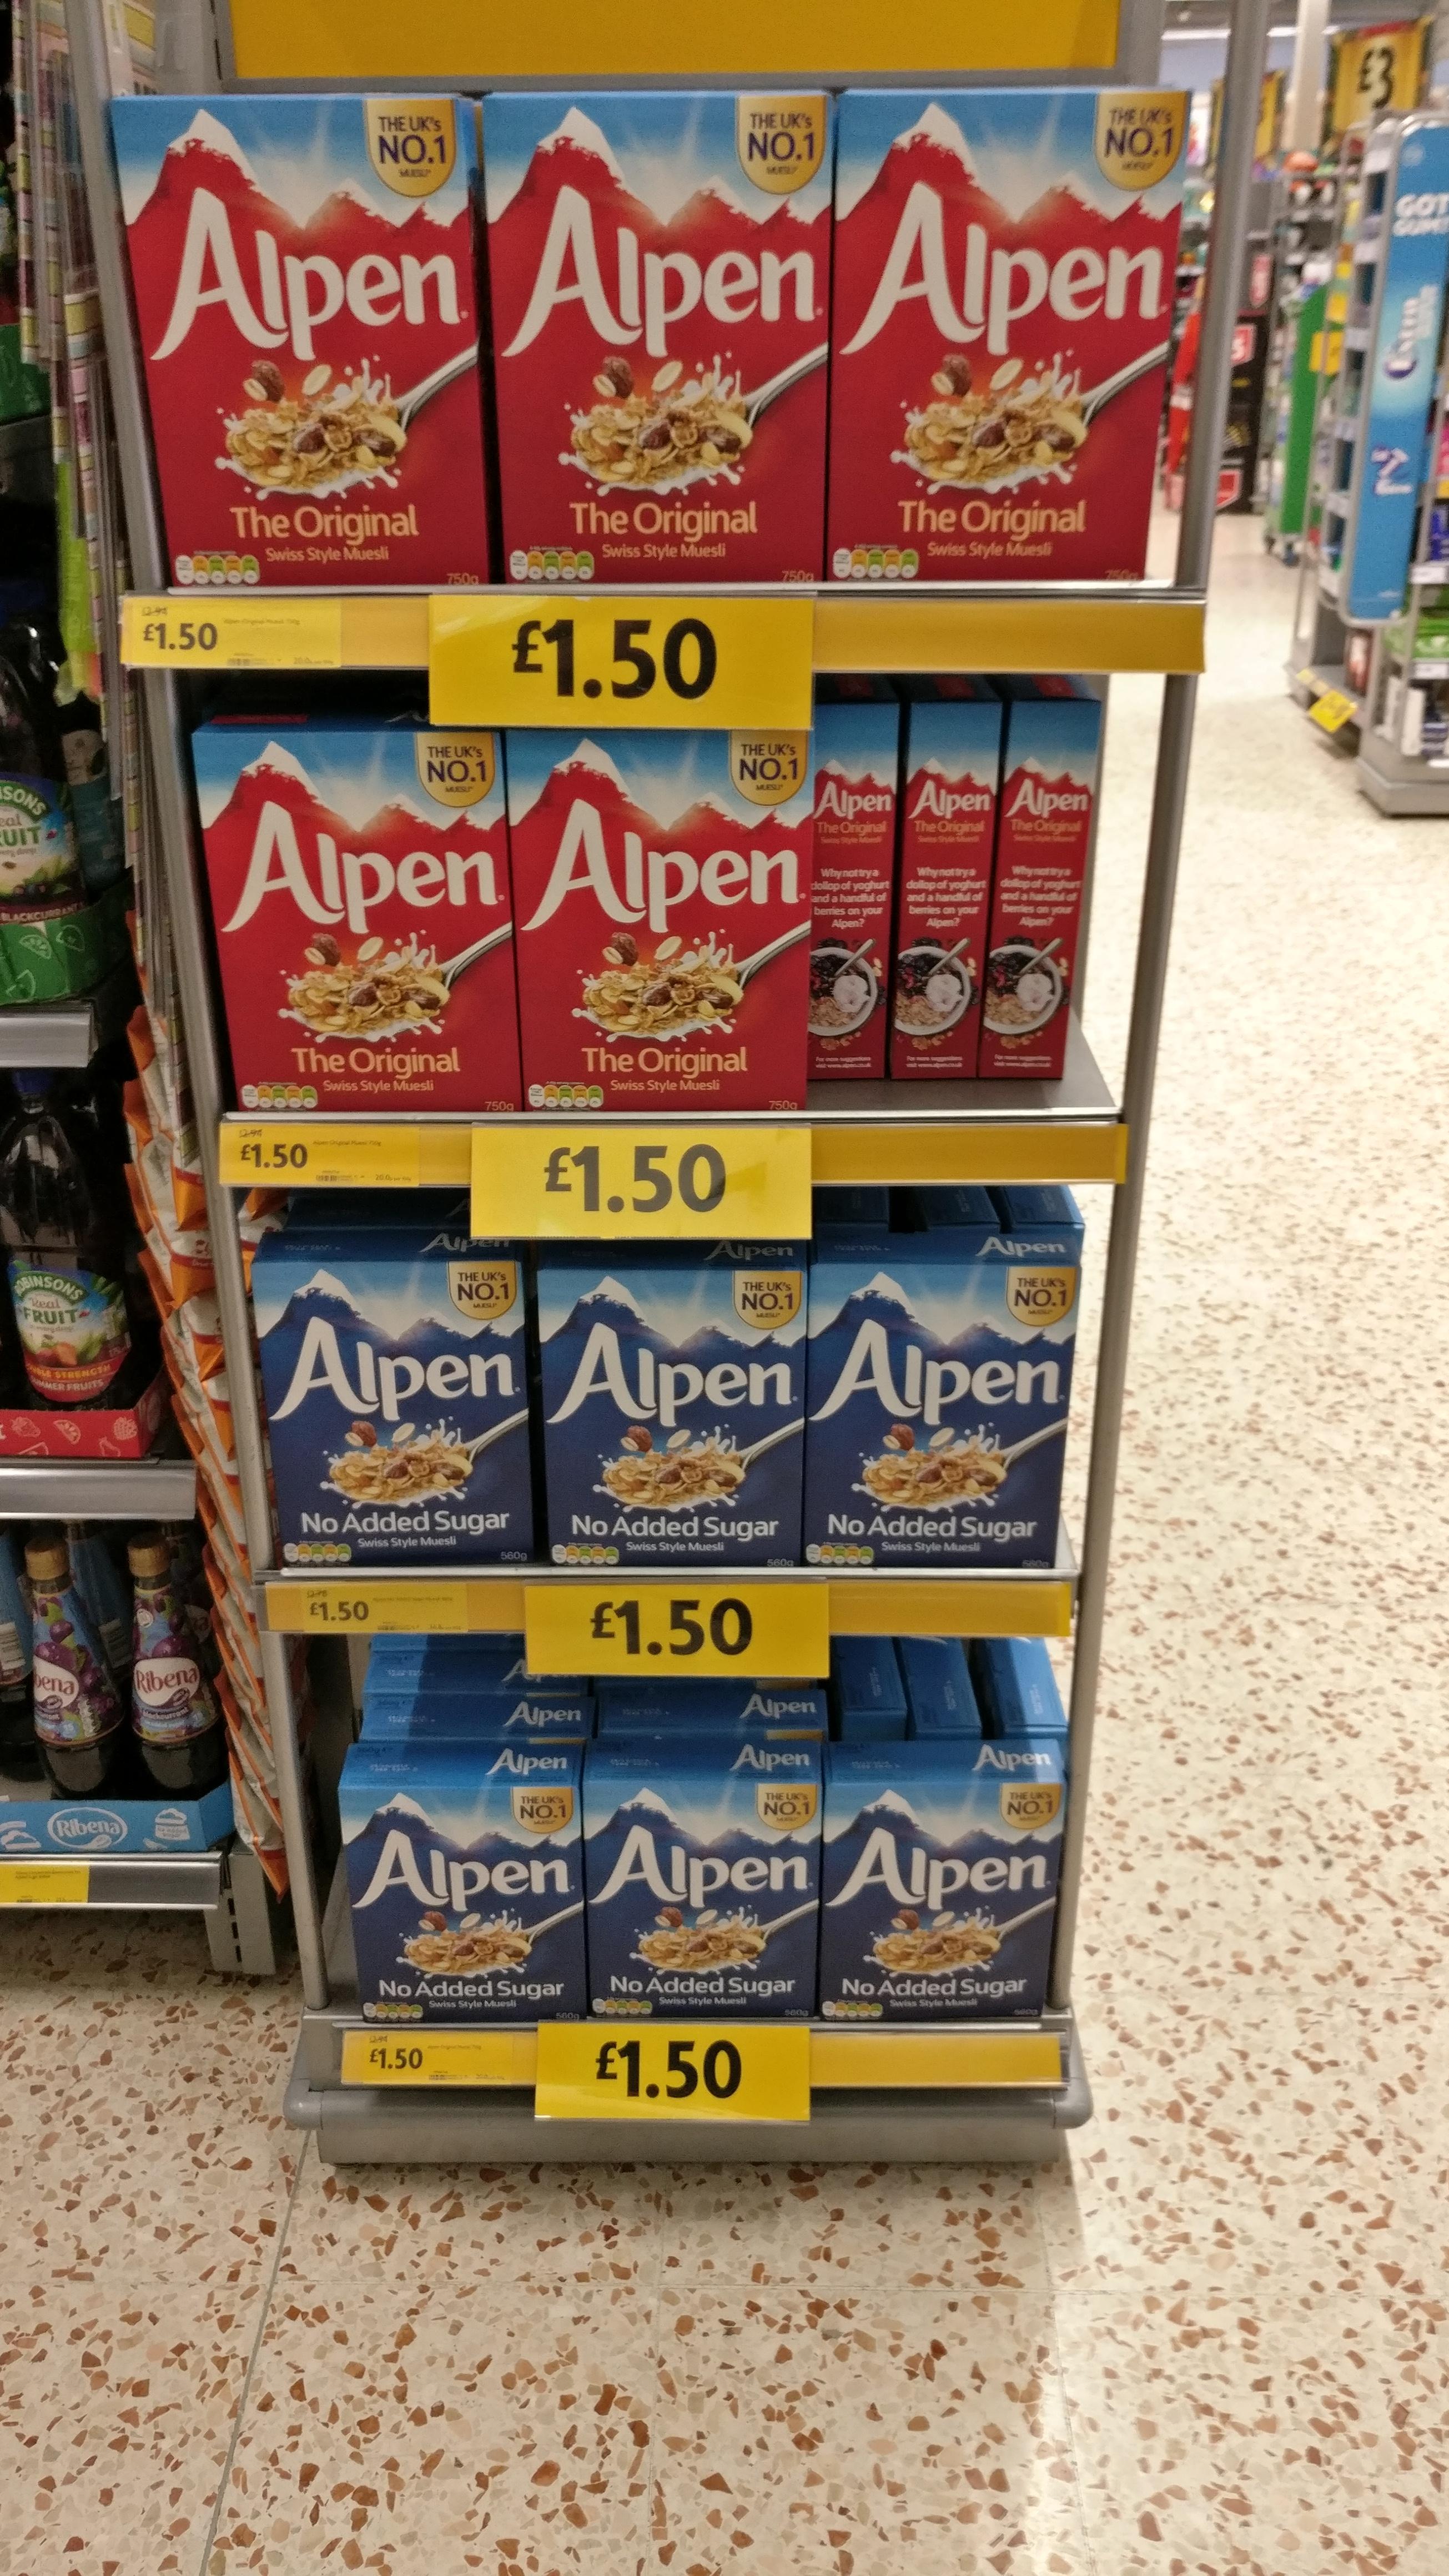 Alpen Original Muesli 750g (and 560g no added sugar) £1.50 @ Morrisons